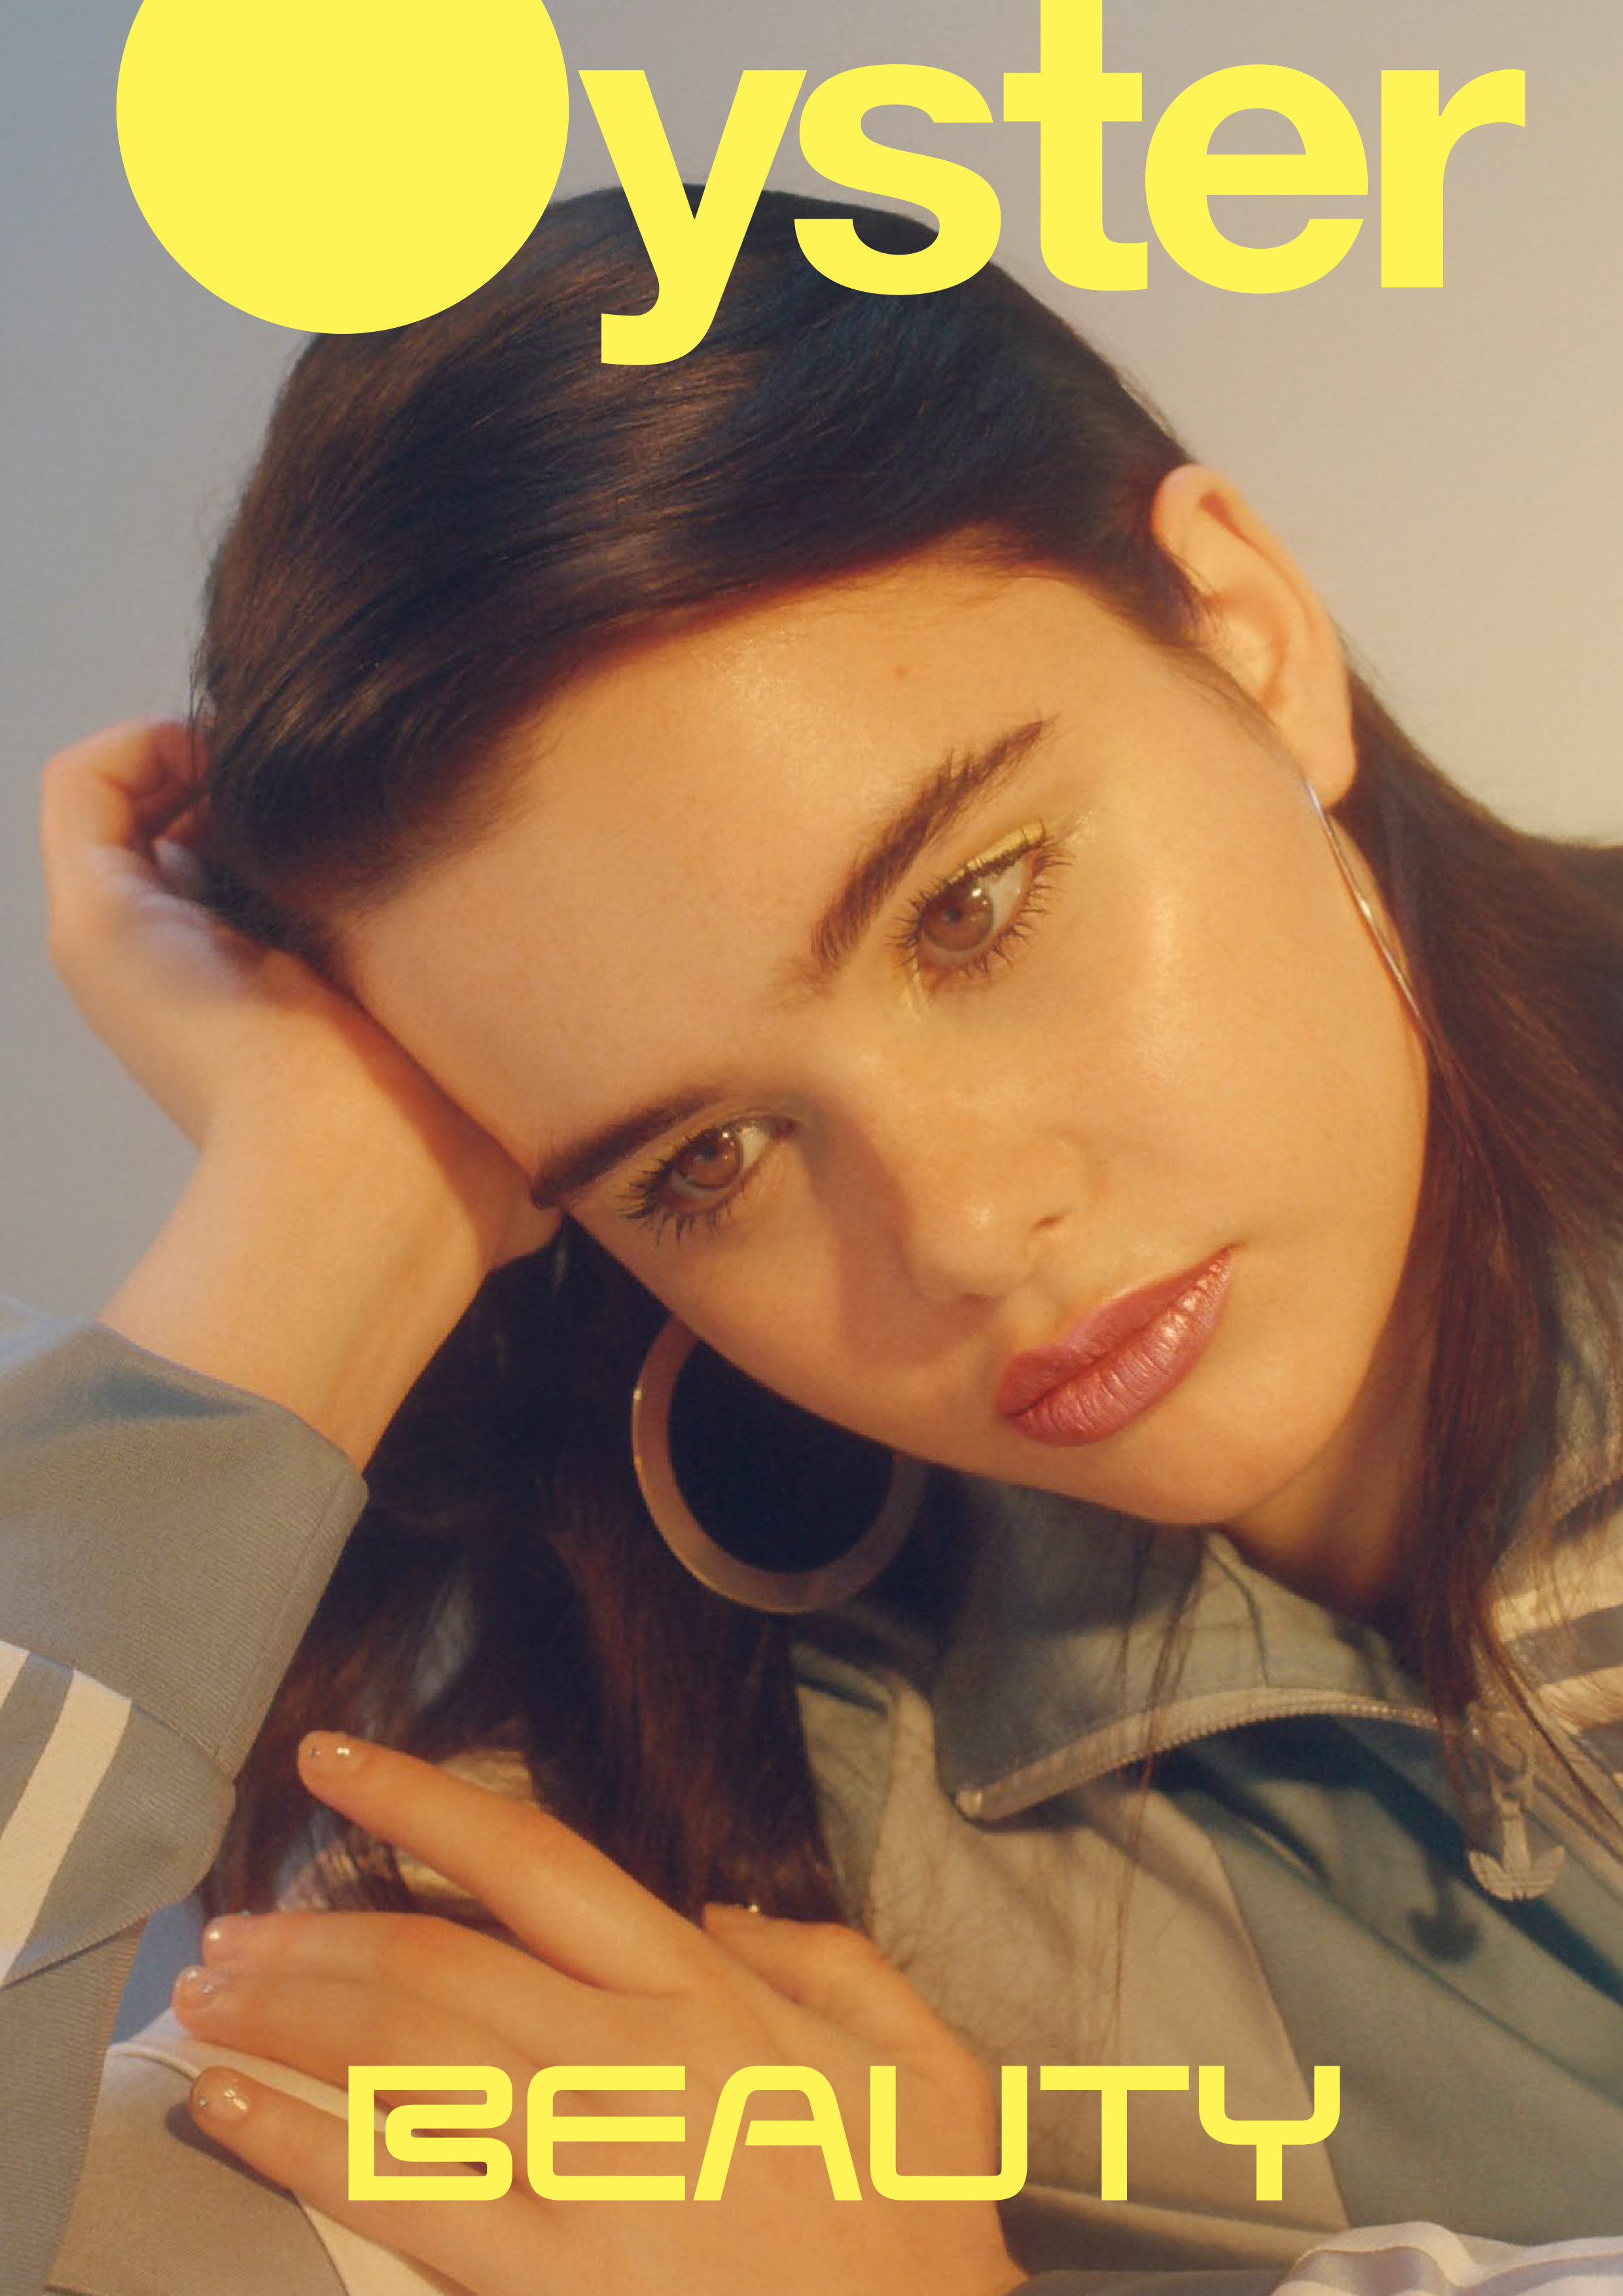 Barbie Ferreira - Oyster 114-1.jpg